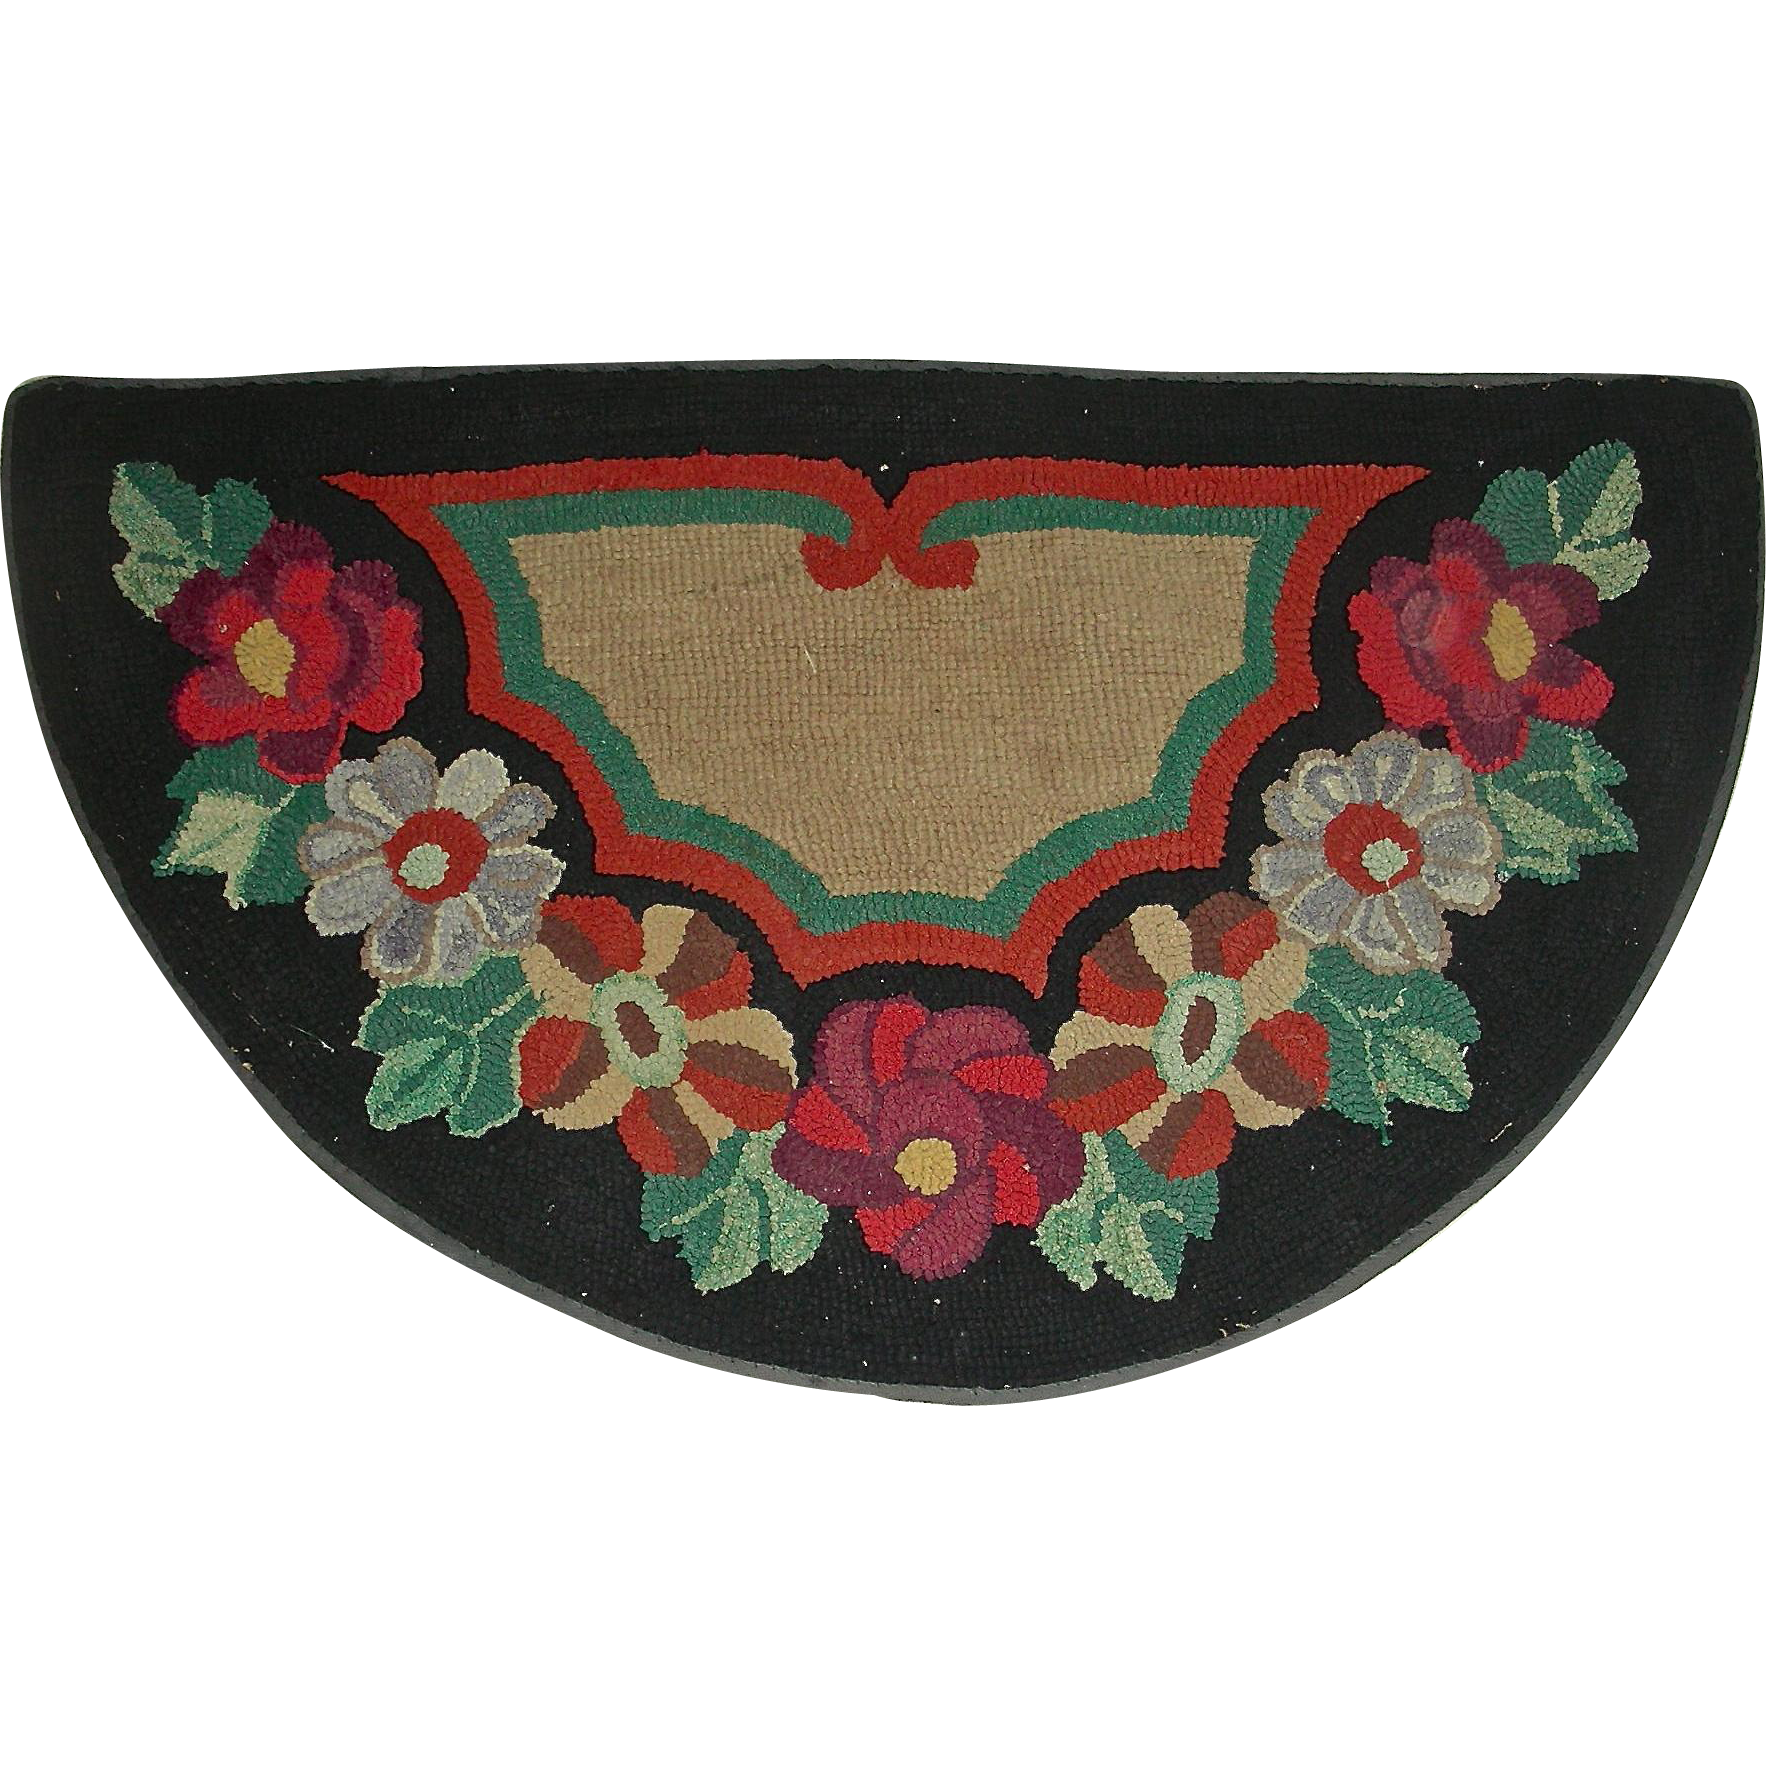 Half Round Floral Hooked Rug, c. 1930-1940